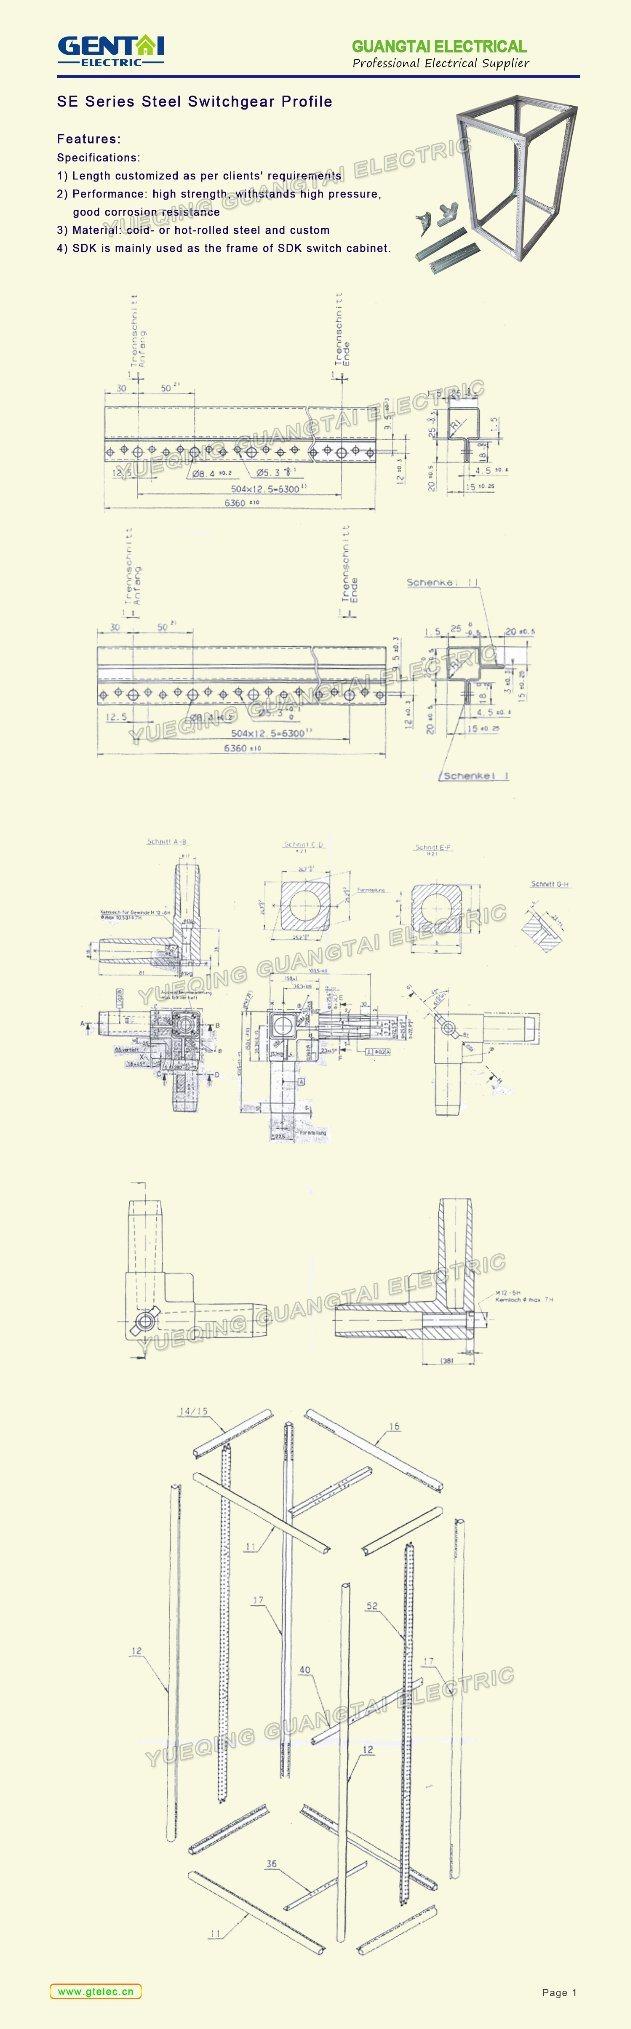 Good Quality Ge Design Se Steel Switchgear Profile